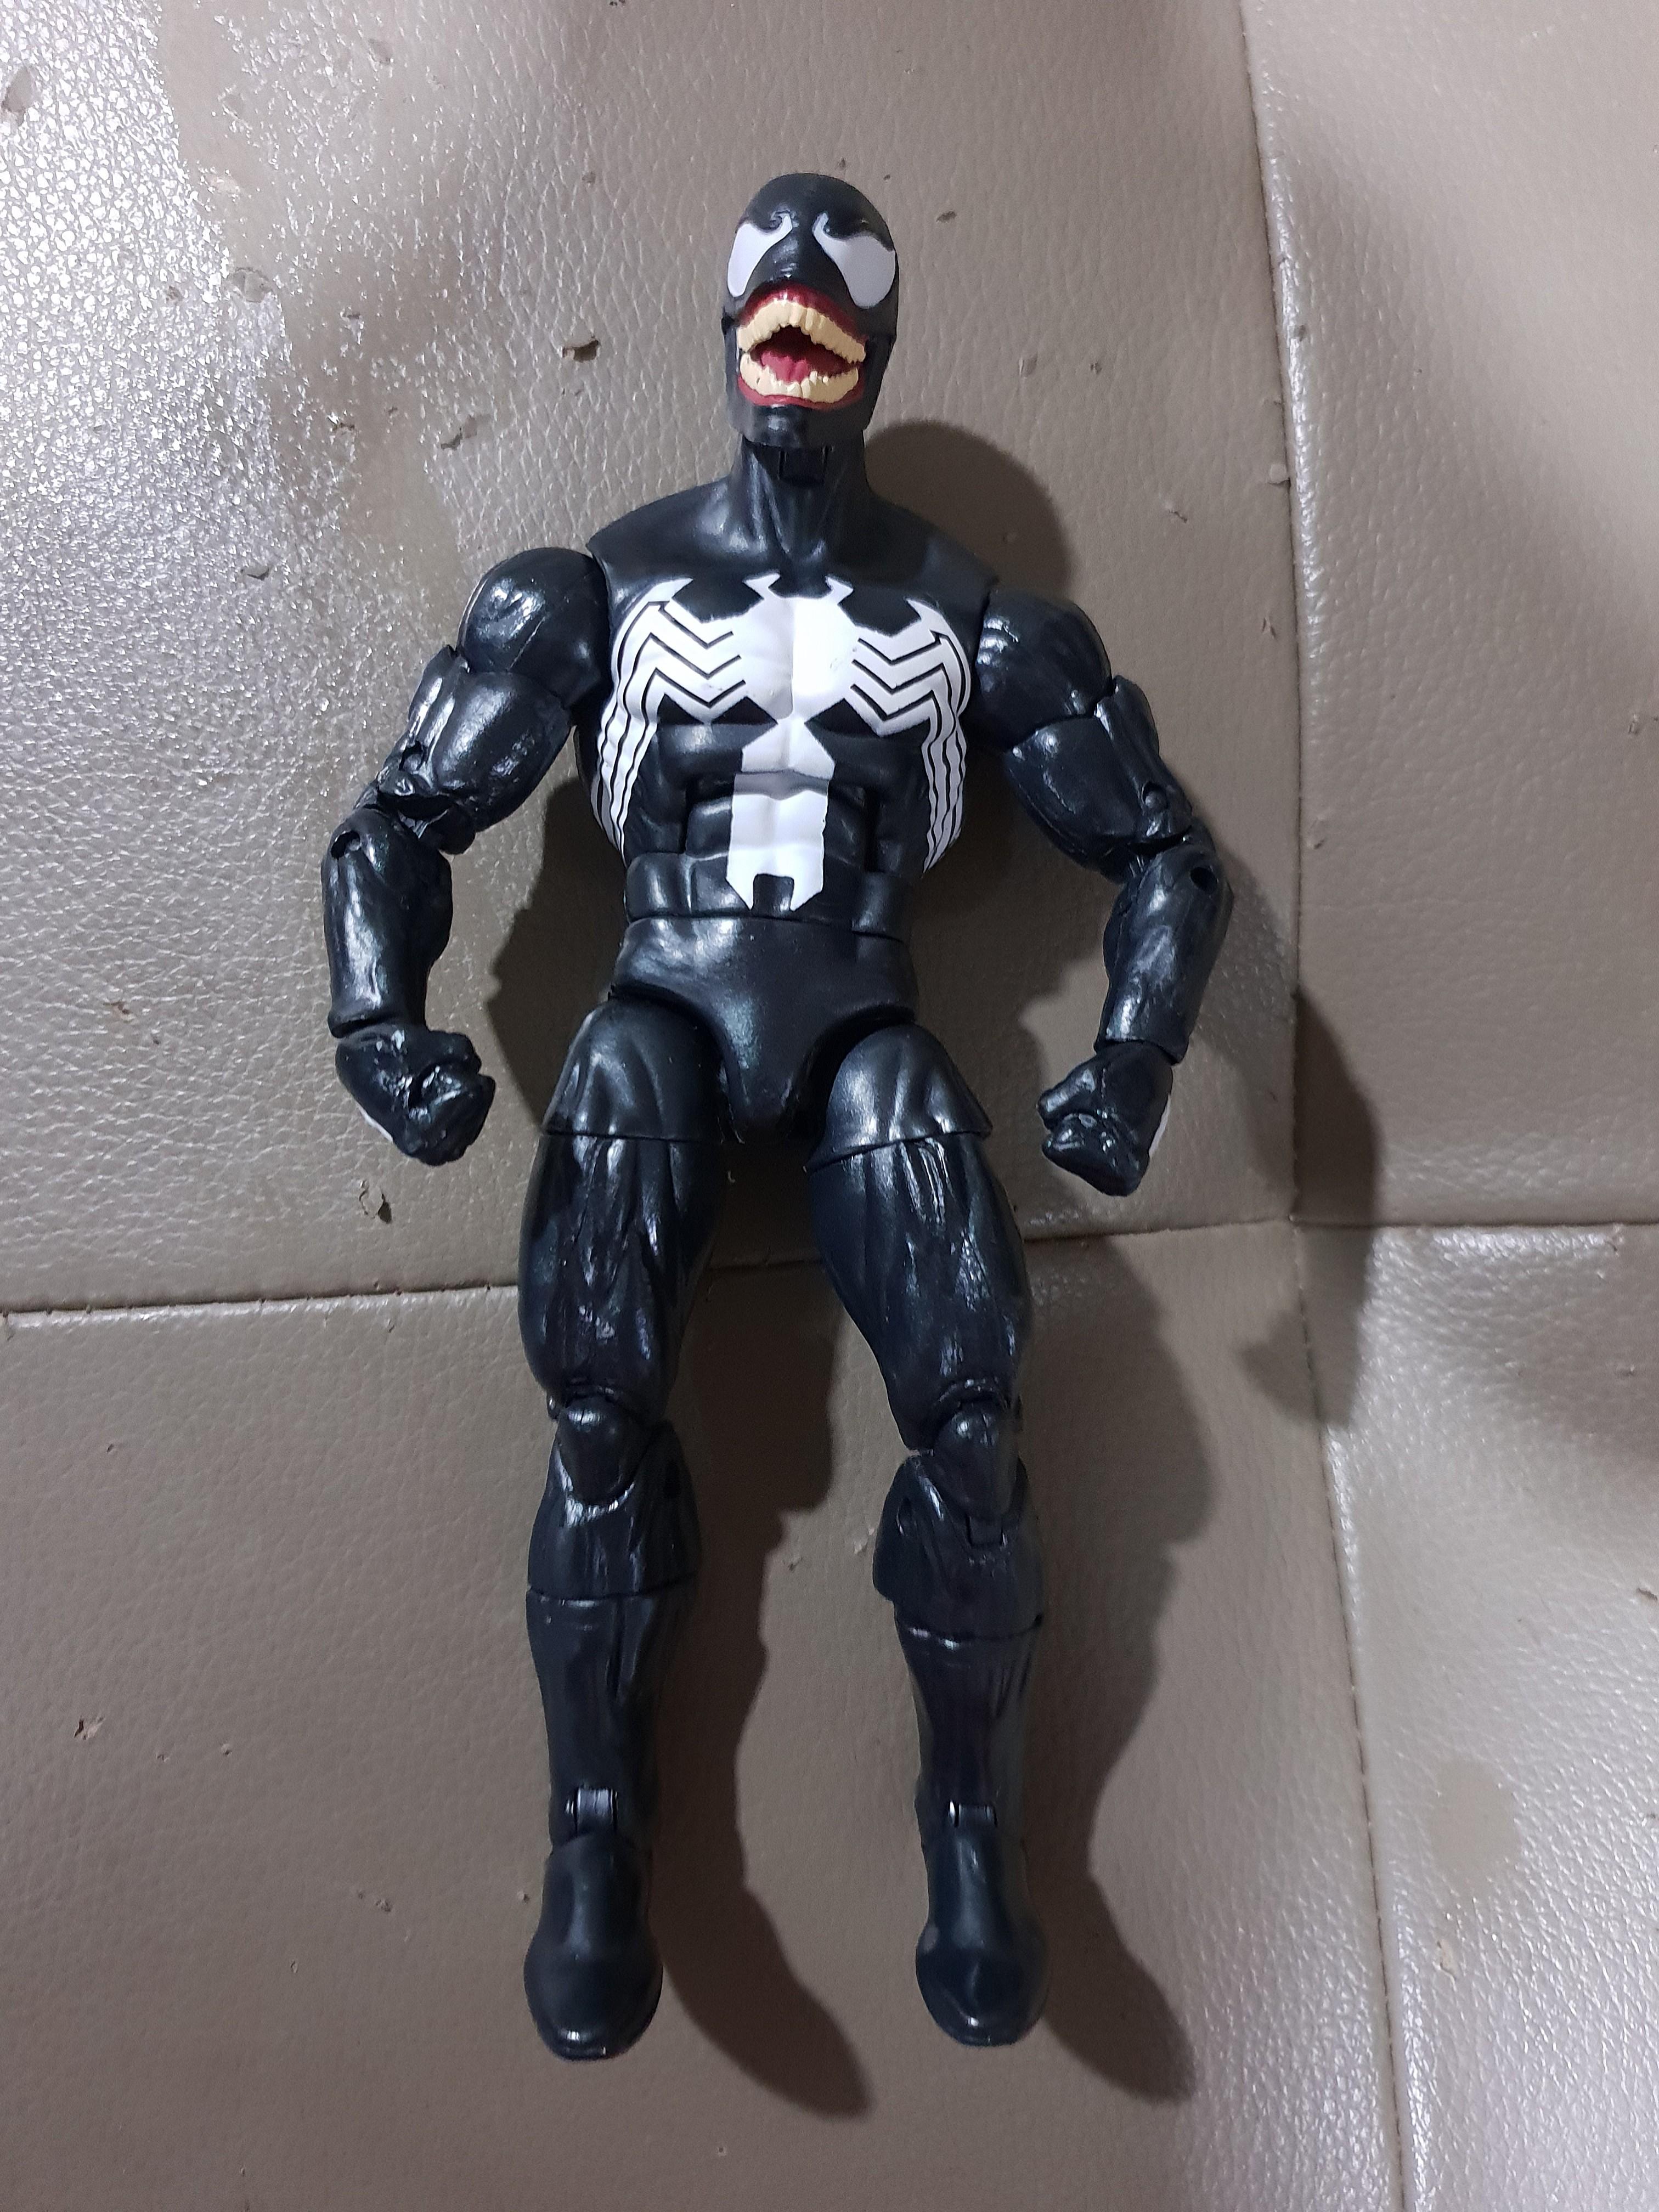 aaf499aaa26b Marvel Legends Venom Spider-man Series (LOOSE NO BOX), Toys & Games ...